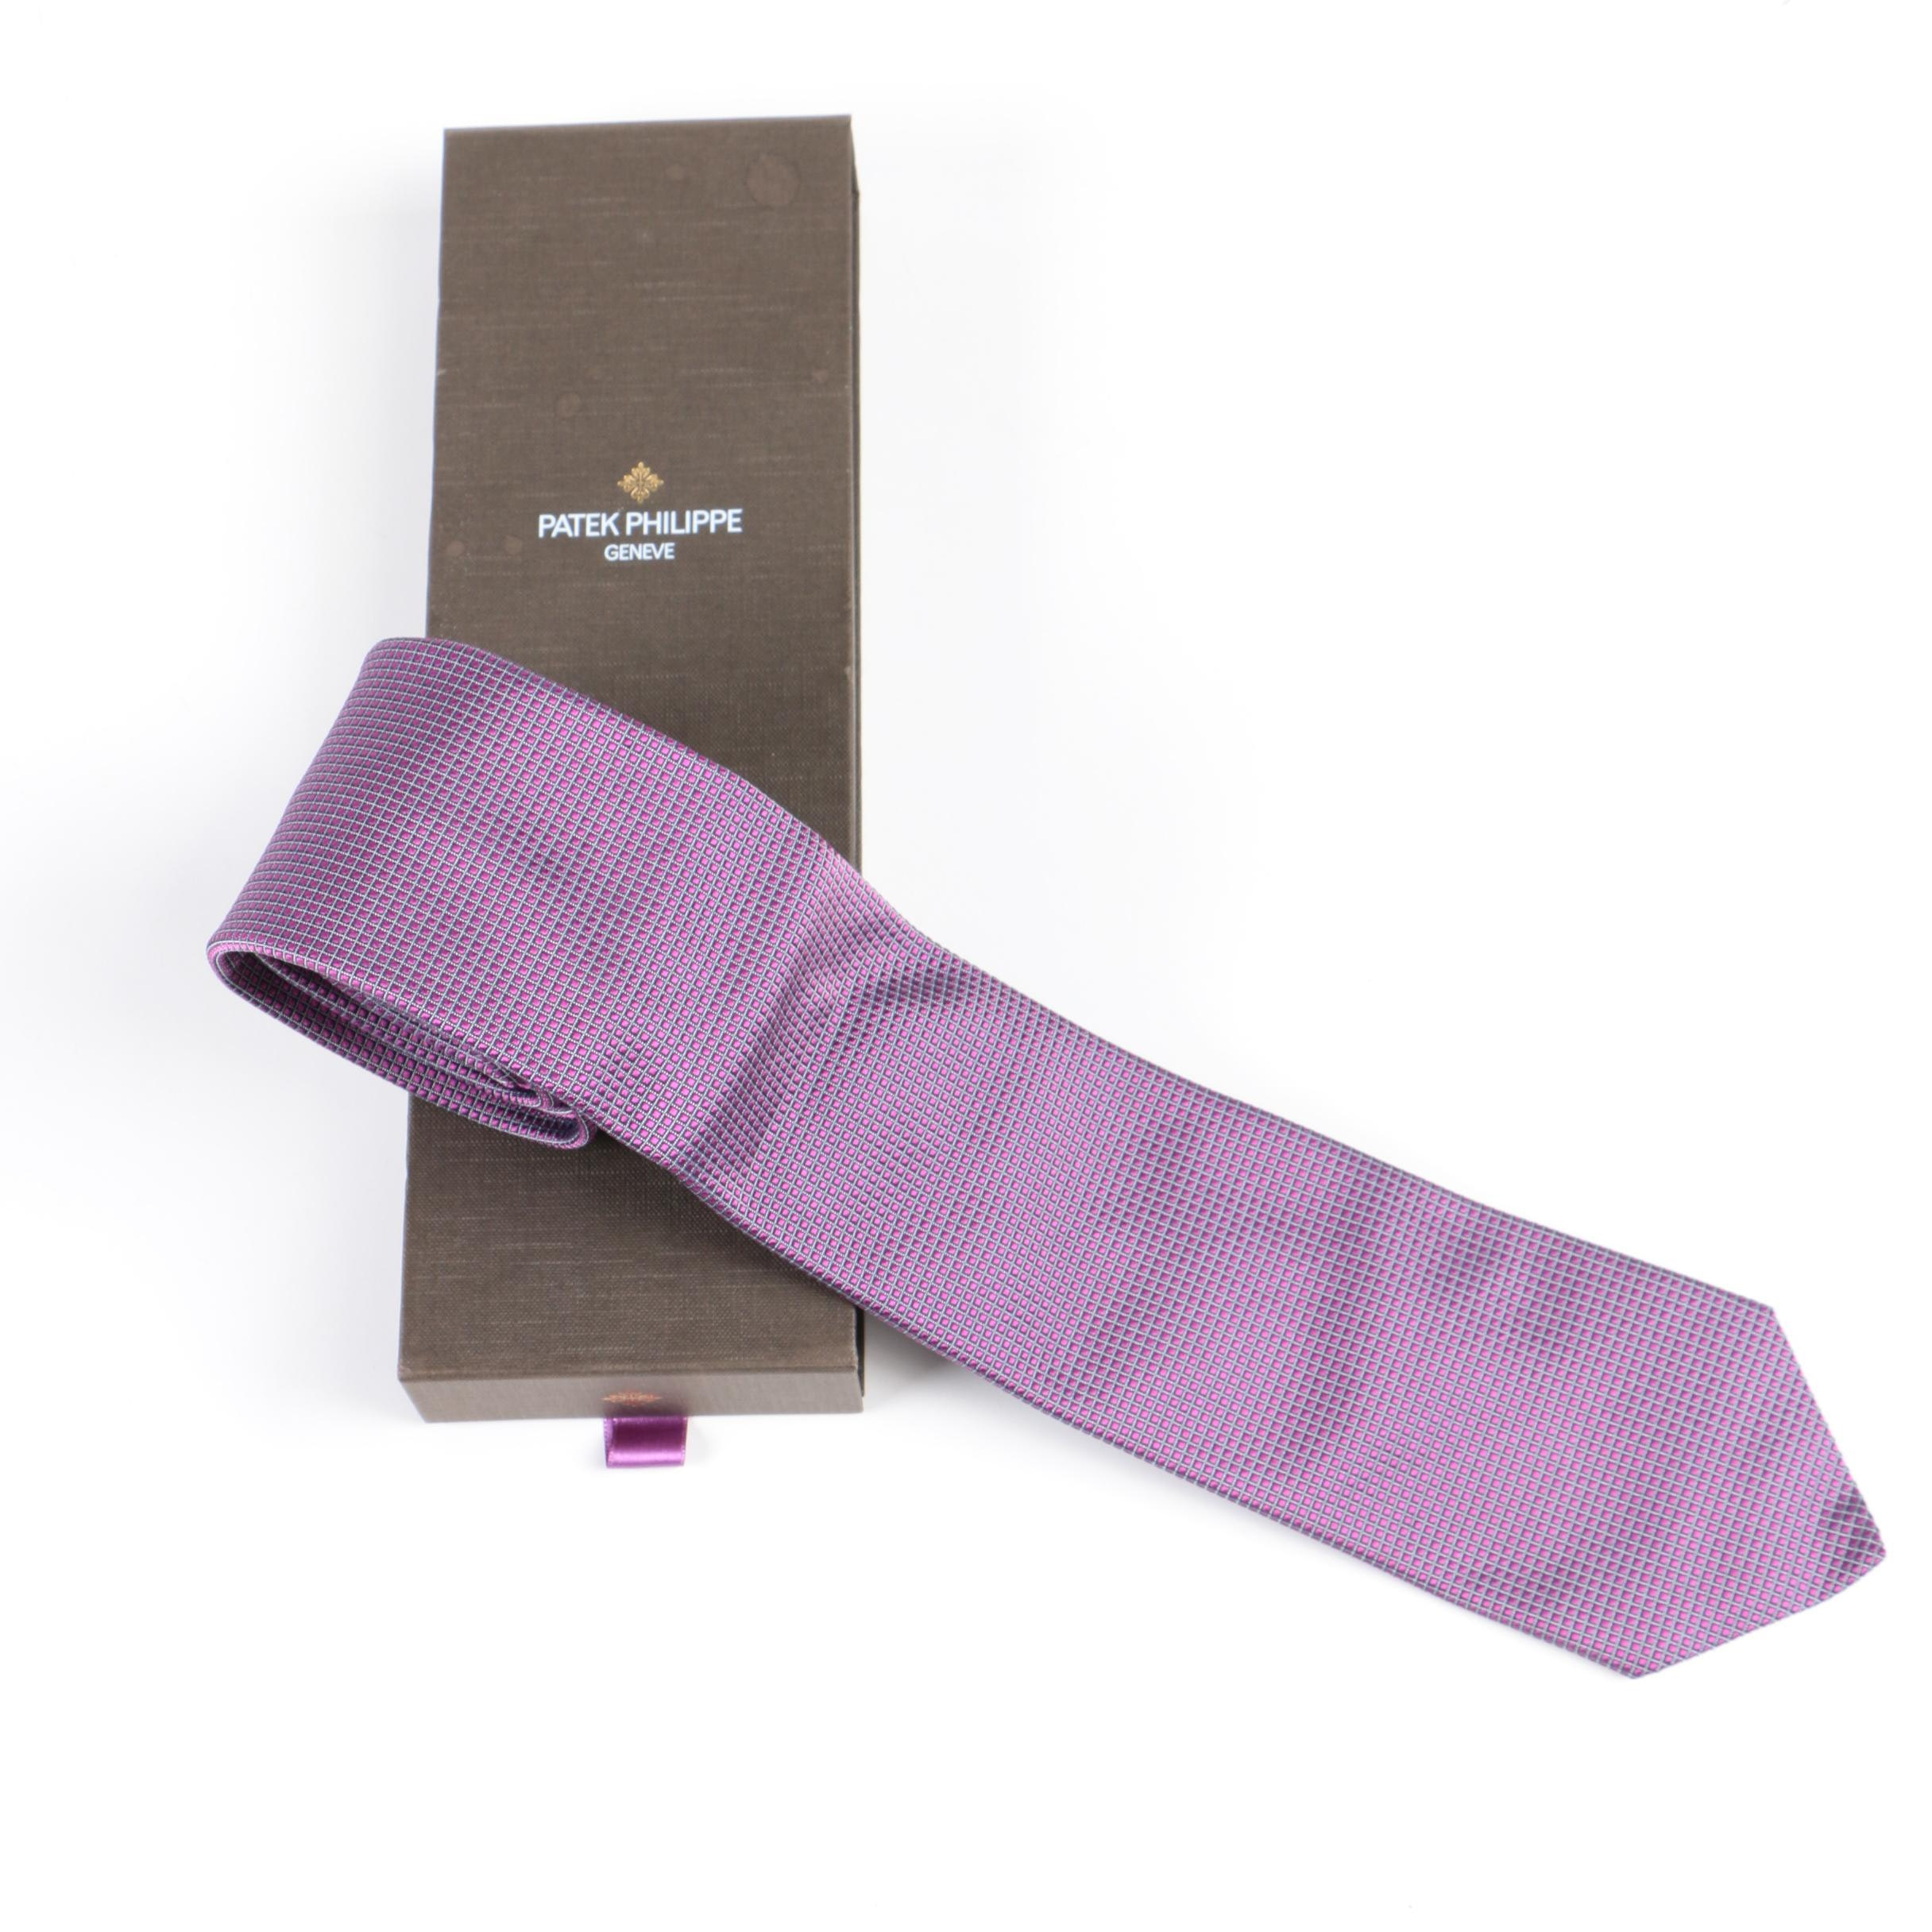 Patek Philippe Geneve Purple and Silver Tone Silk Tie